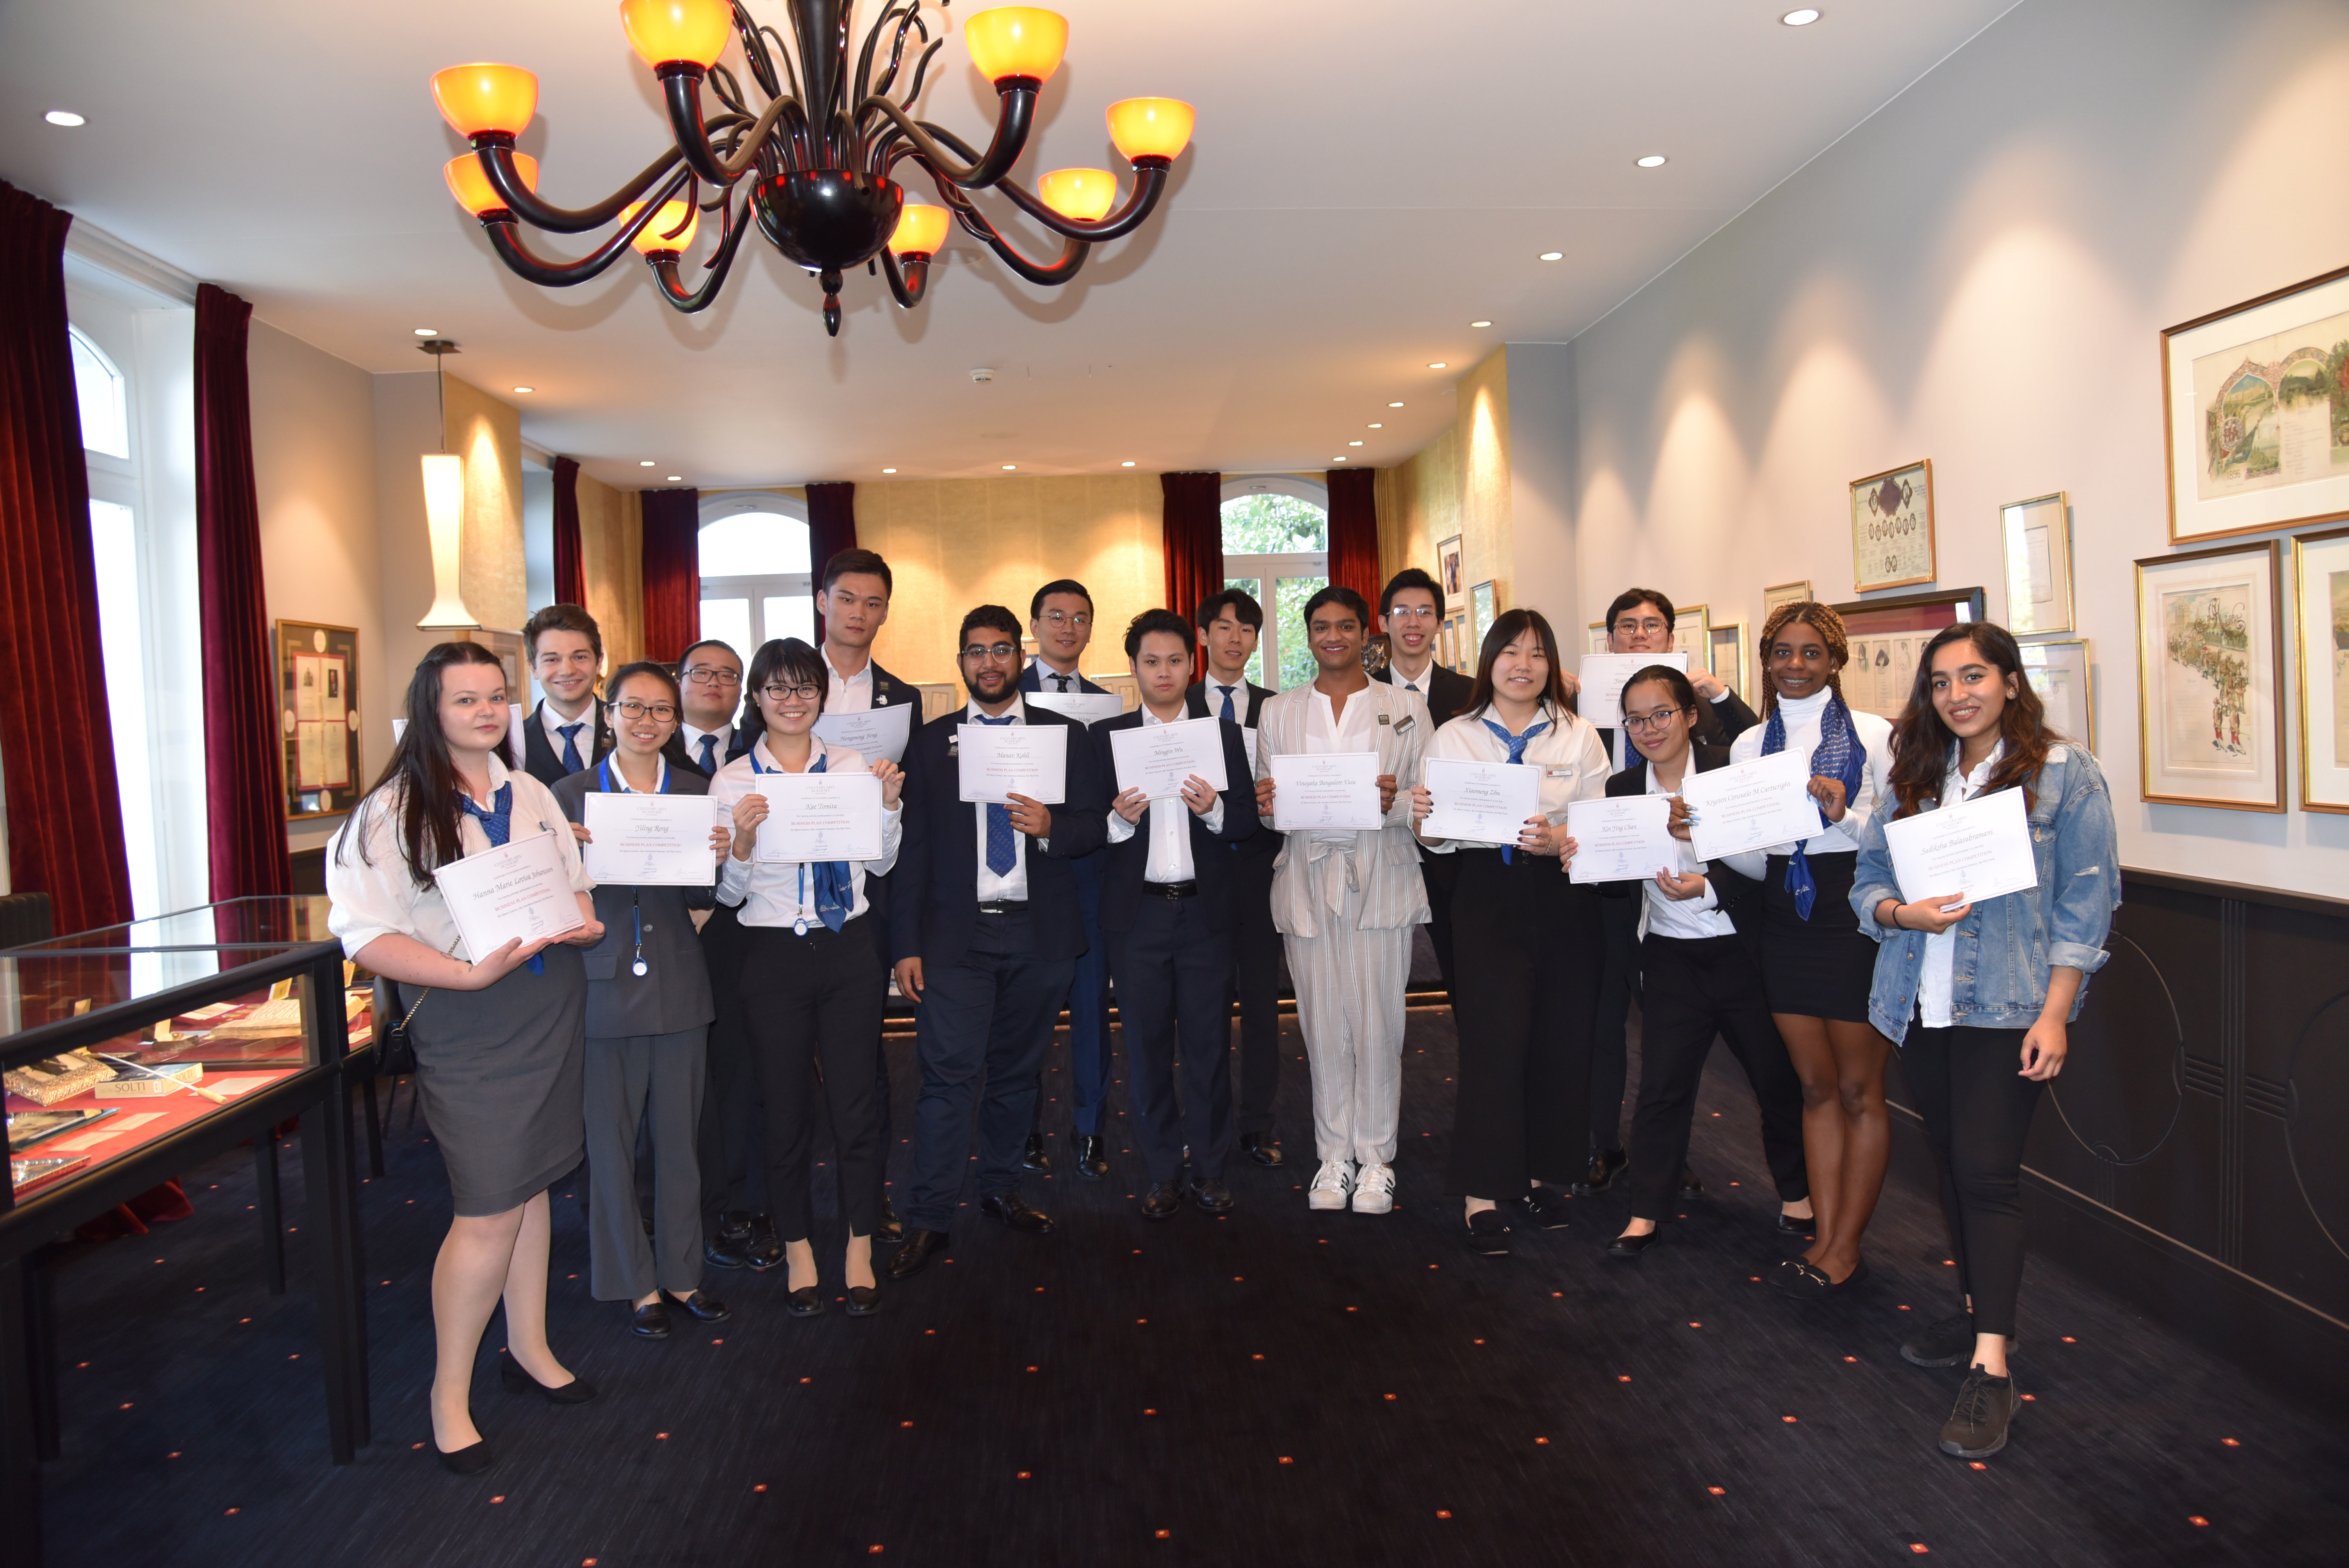 Participants of the business plan competition at César Ritz College Switzerland